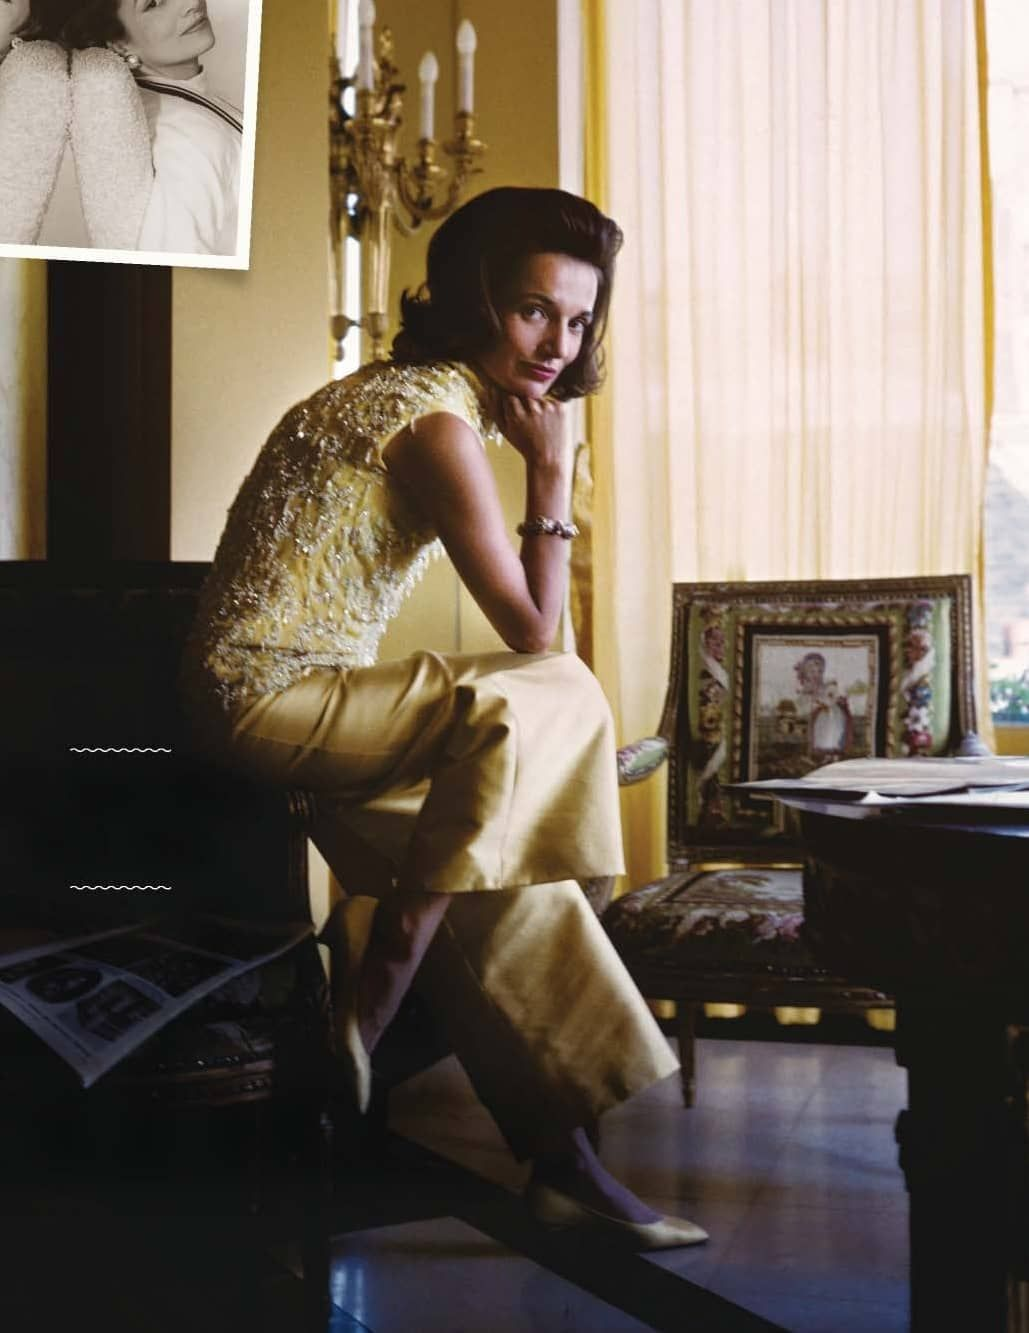 Tuesday Weld,Donna Cruz (b. 1977) Hot picture Shamim Ara,Dorothy Seacombe